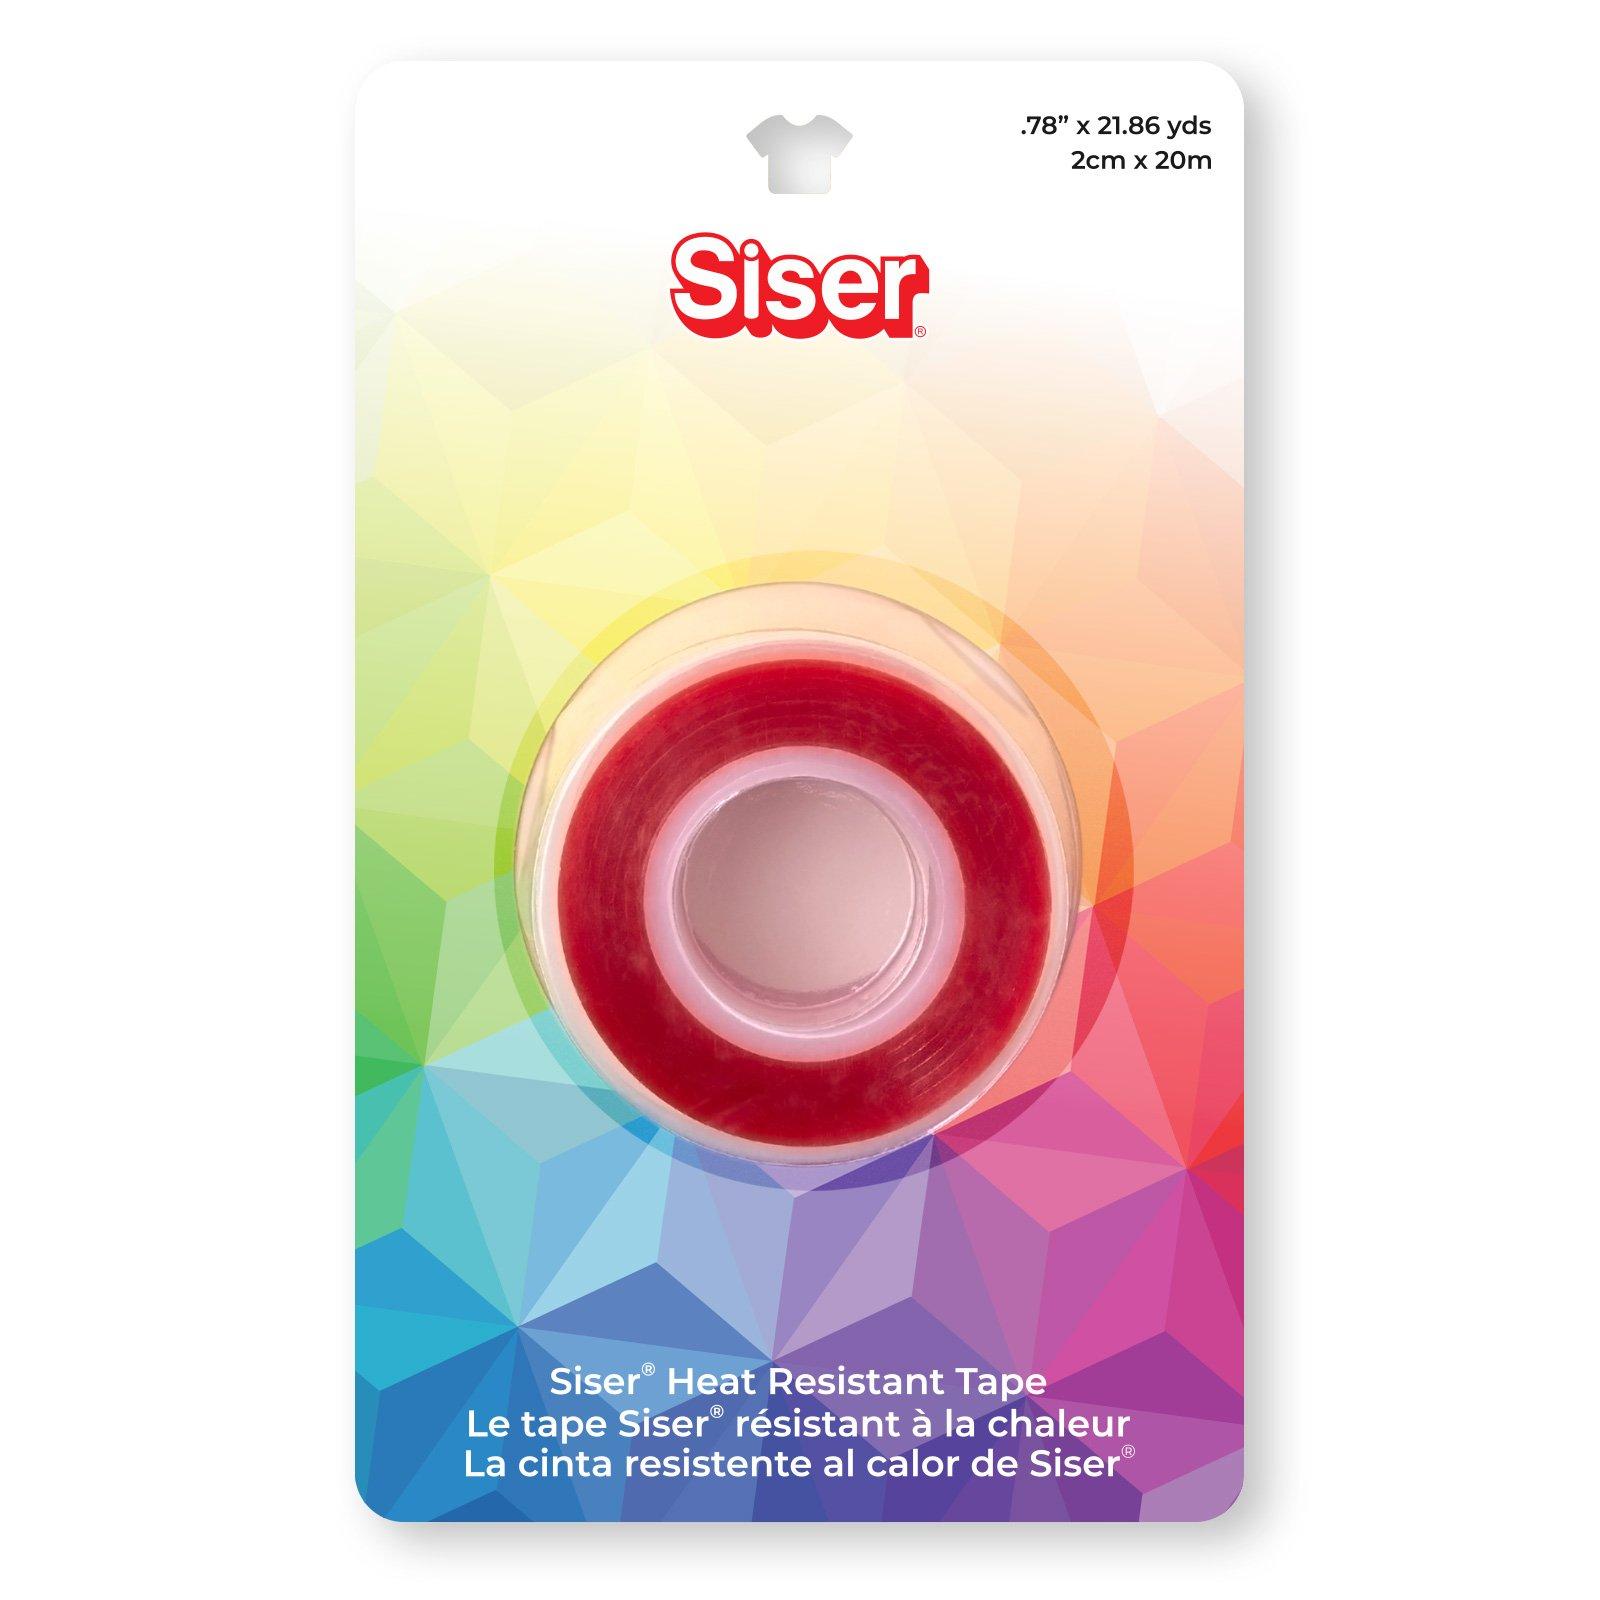 Siser Heat Resistant Tape